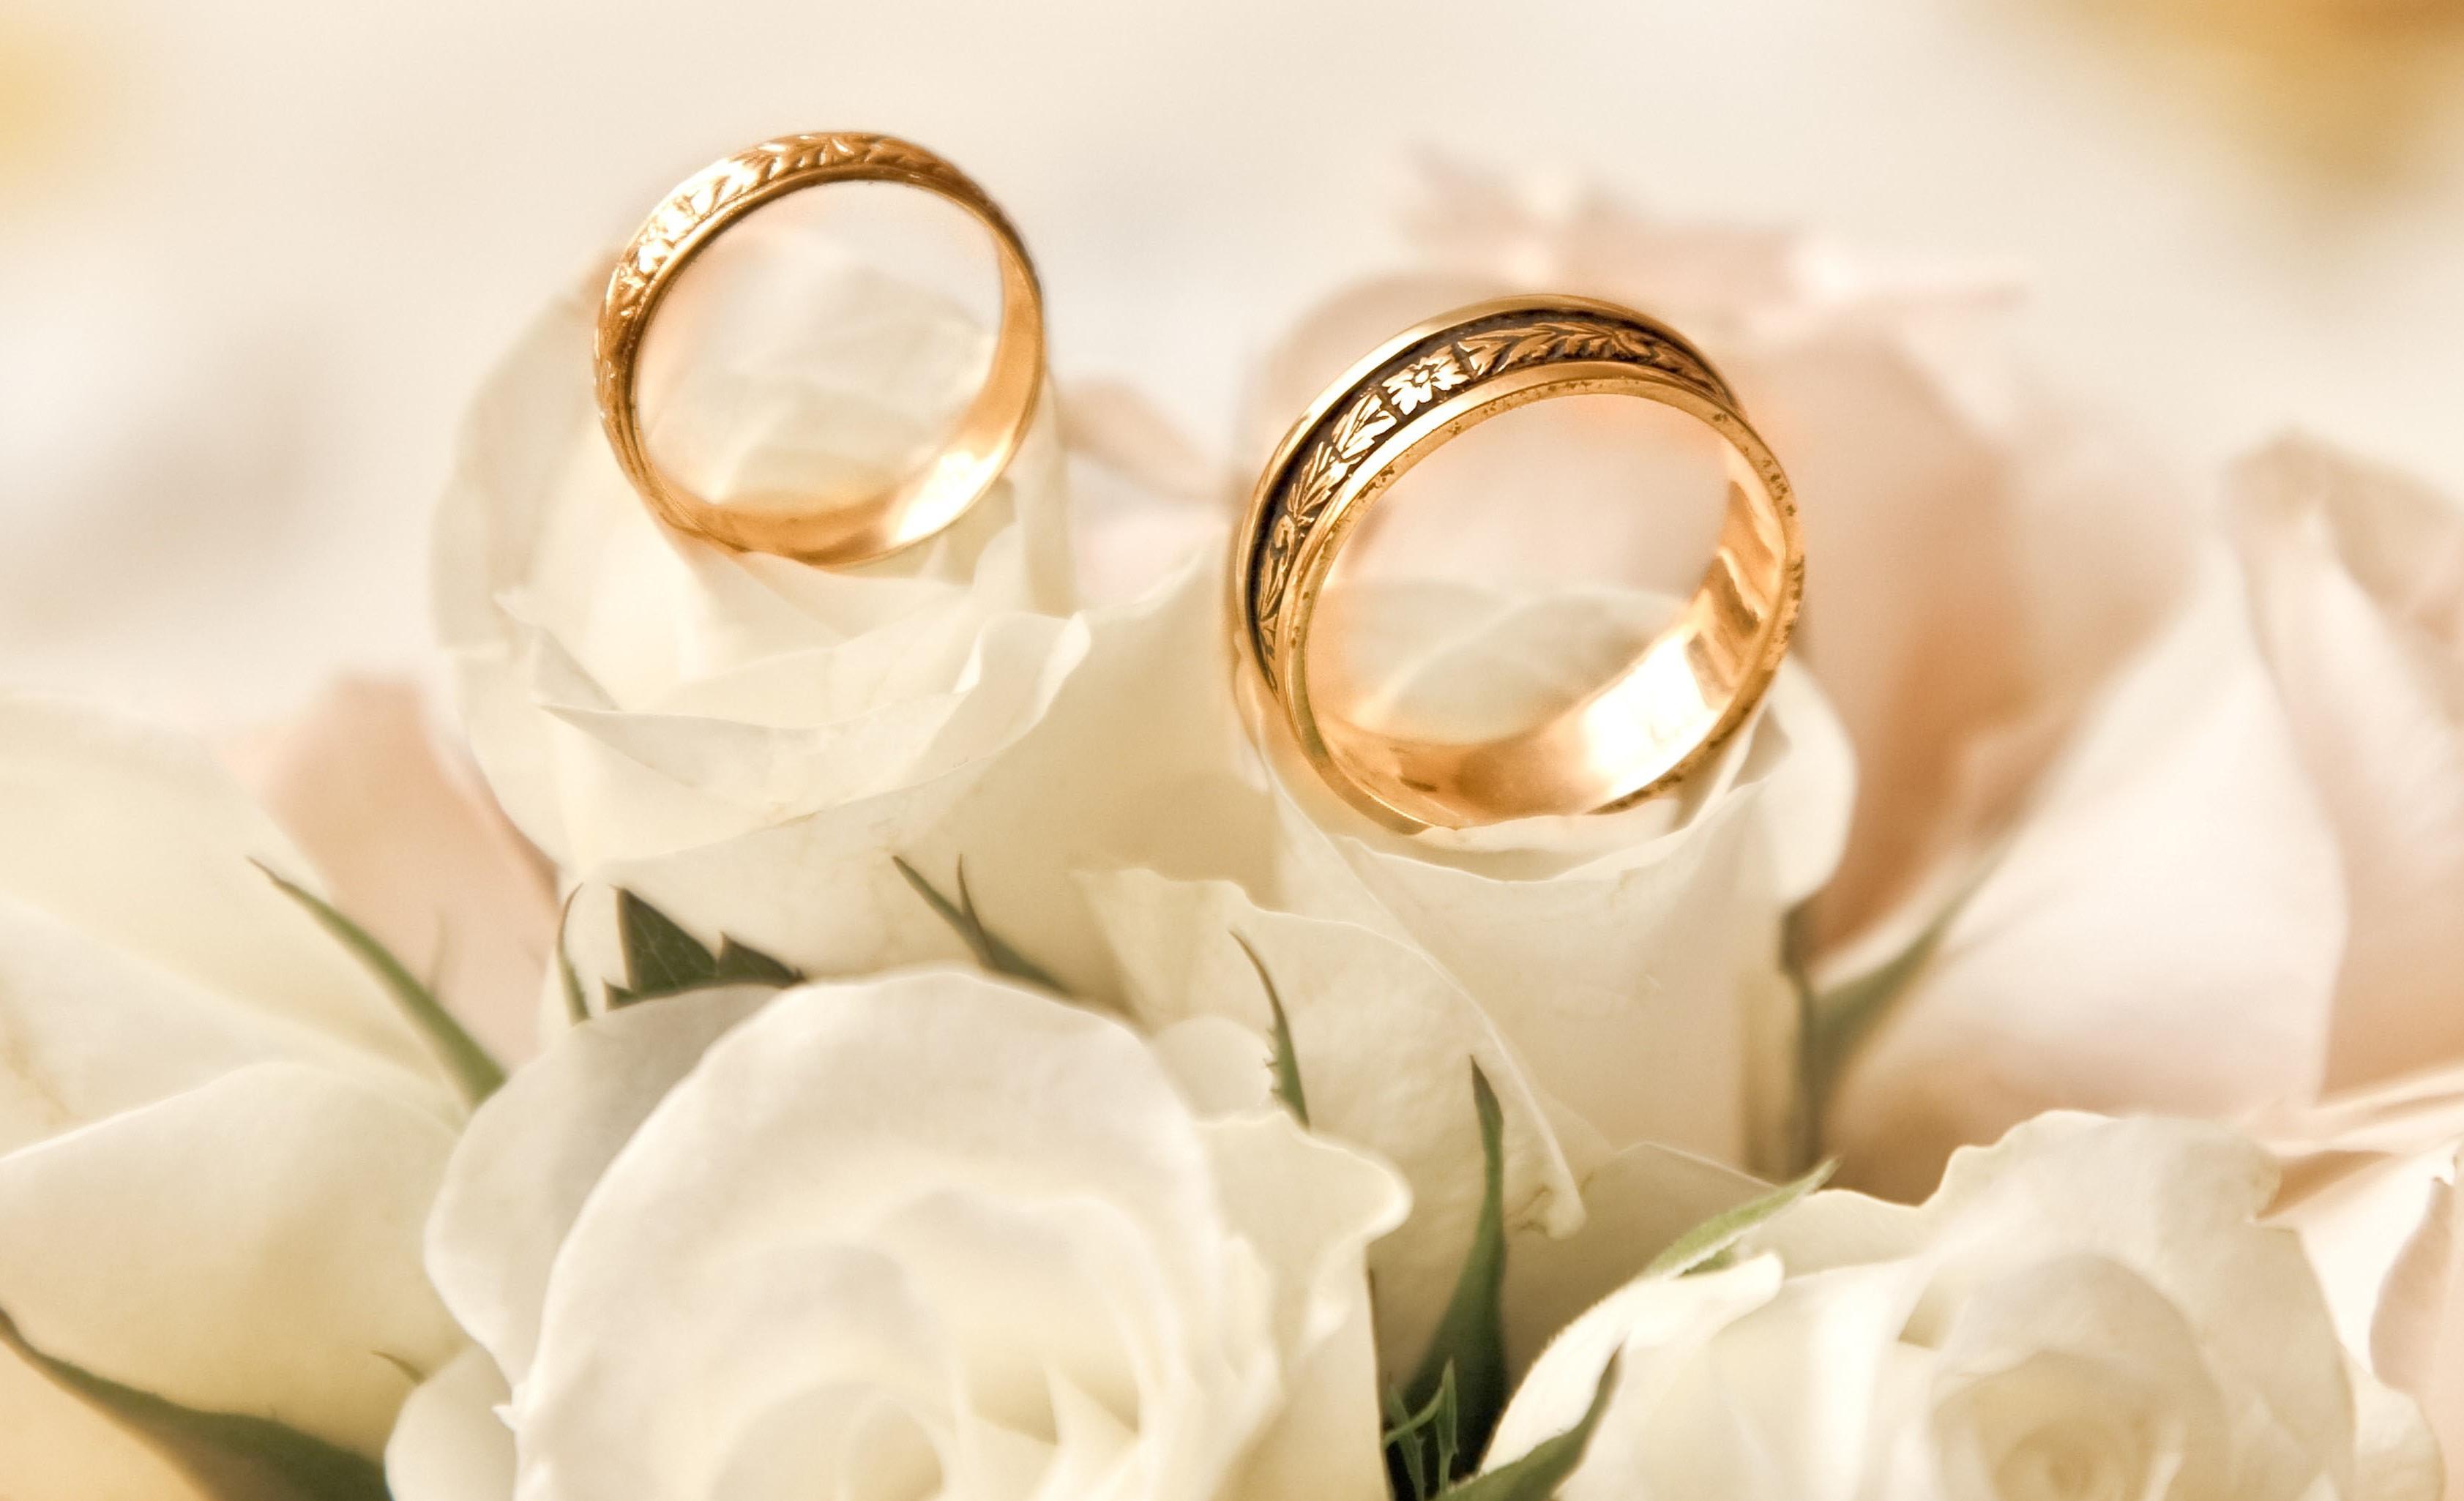 Matrimonio En Biblia : Sullana inscripciones para matrimonios masivos será hasta